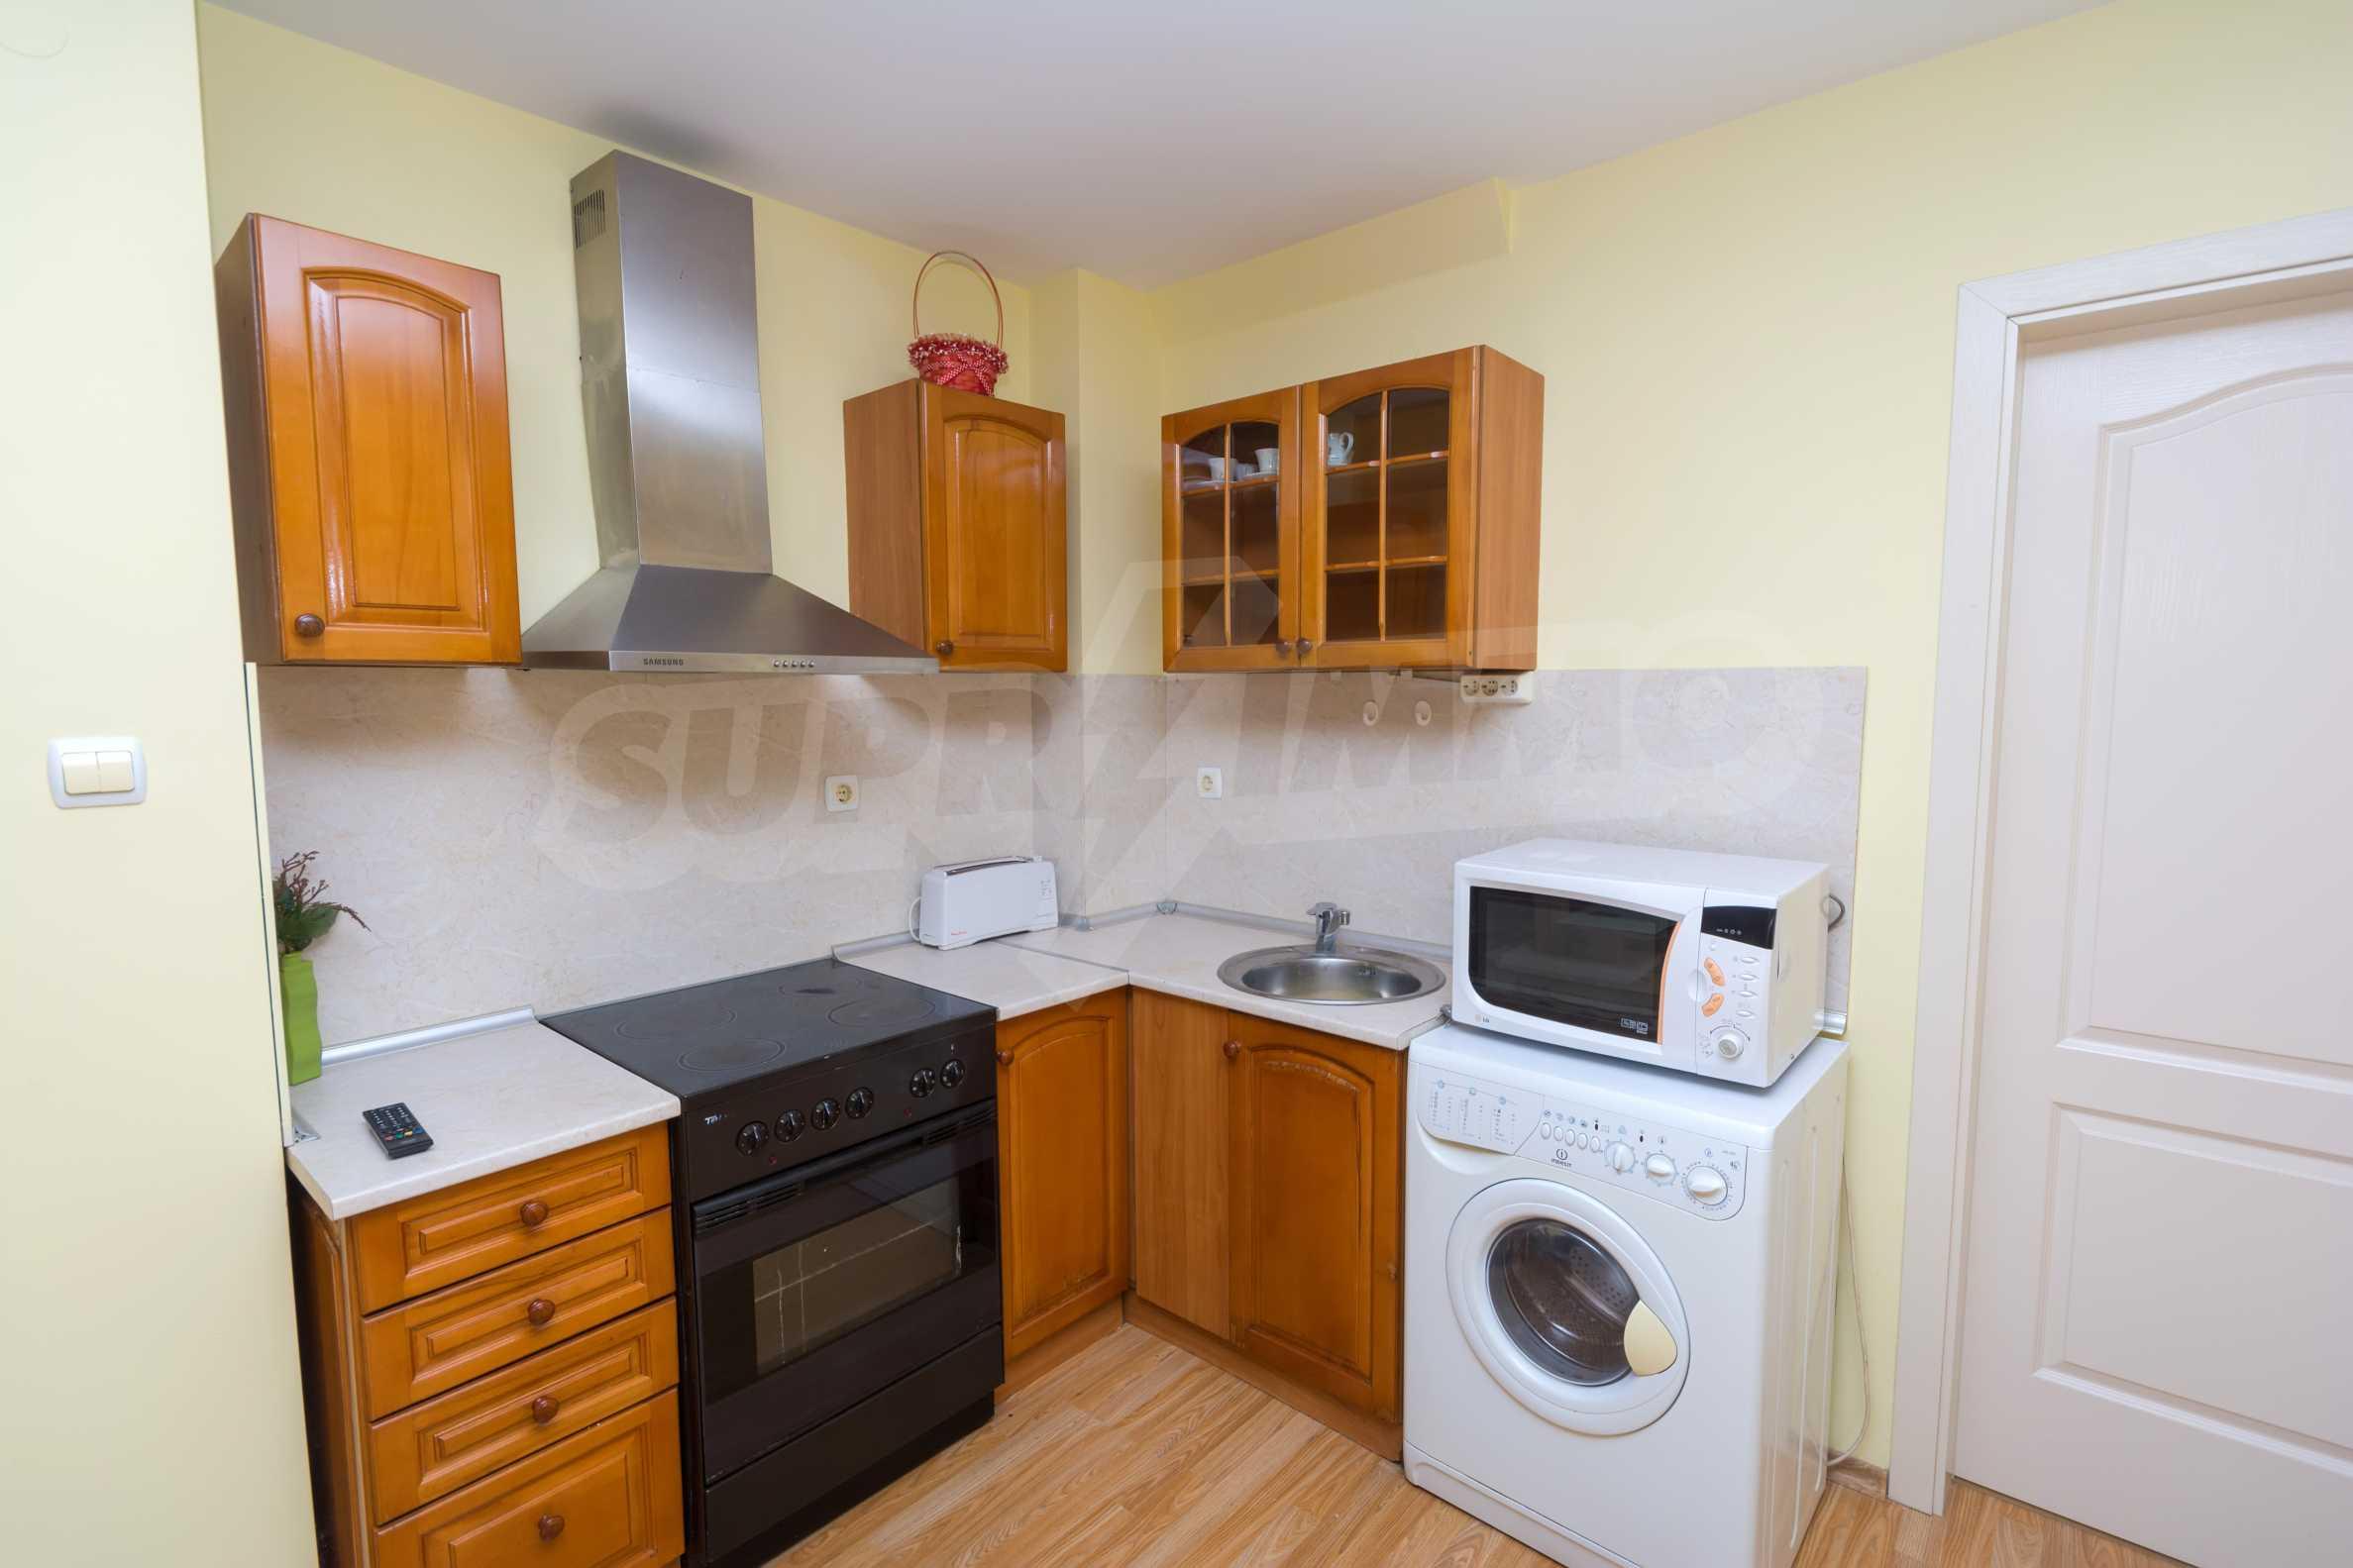 Многостаен апартамент до Гранд Хотел Пловдив 11